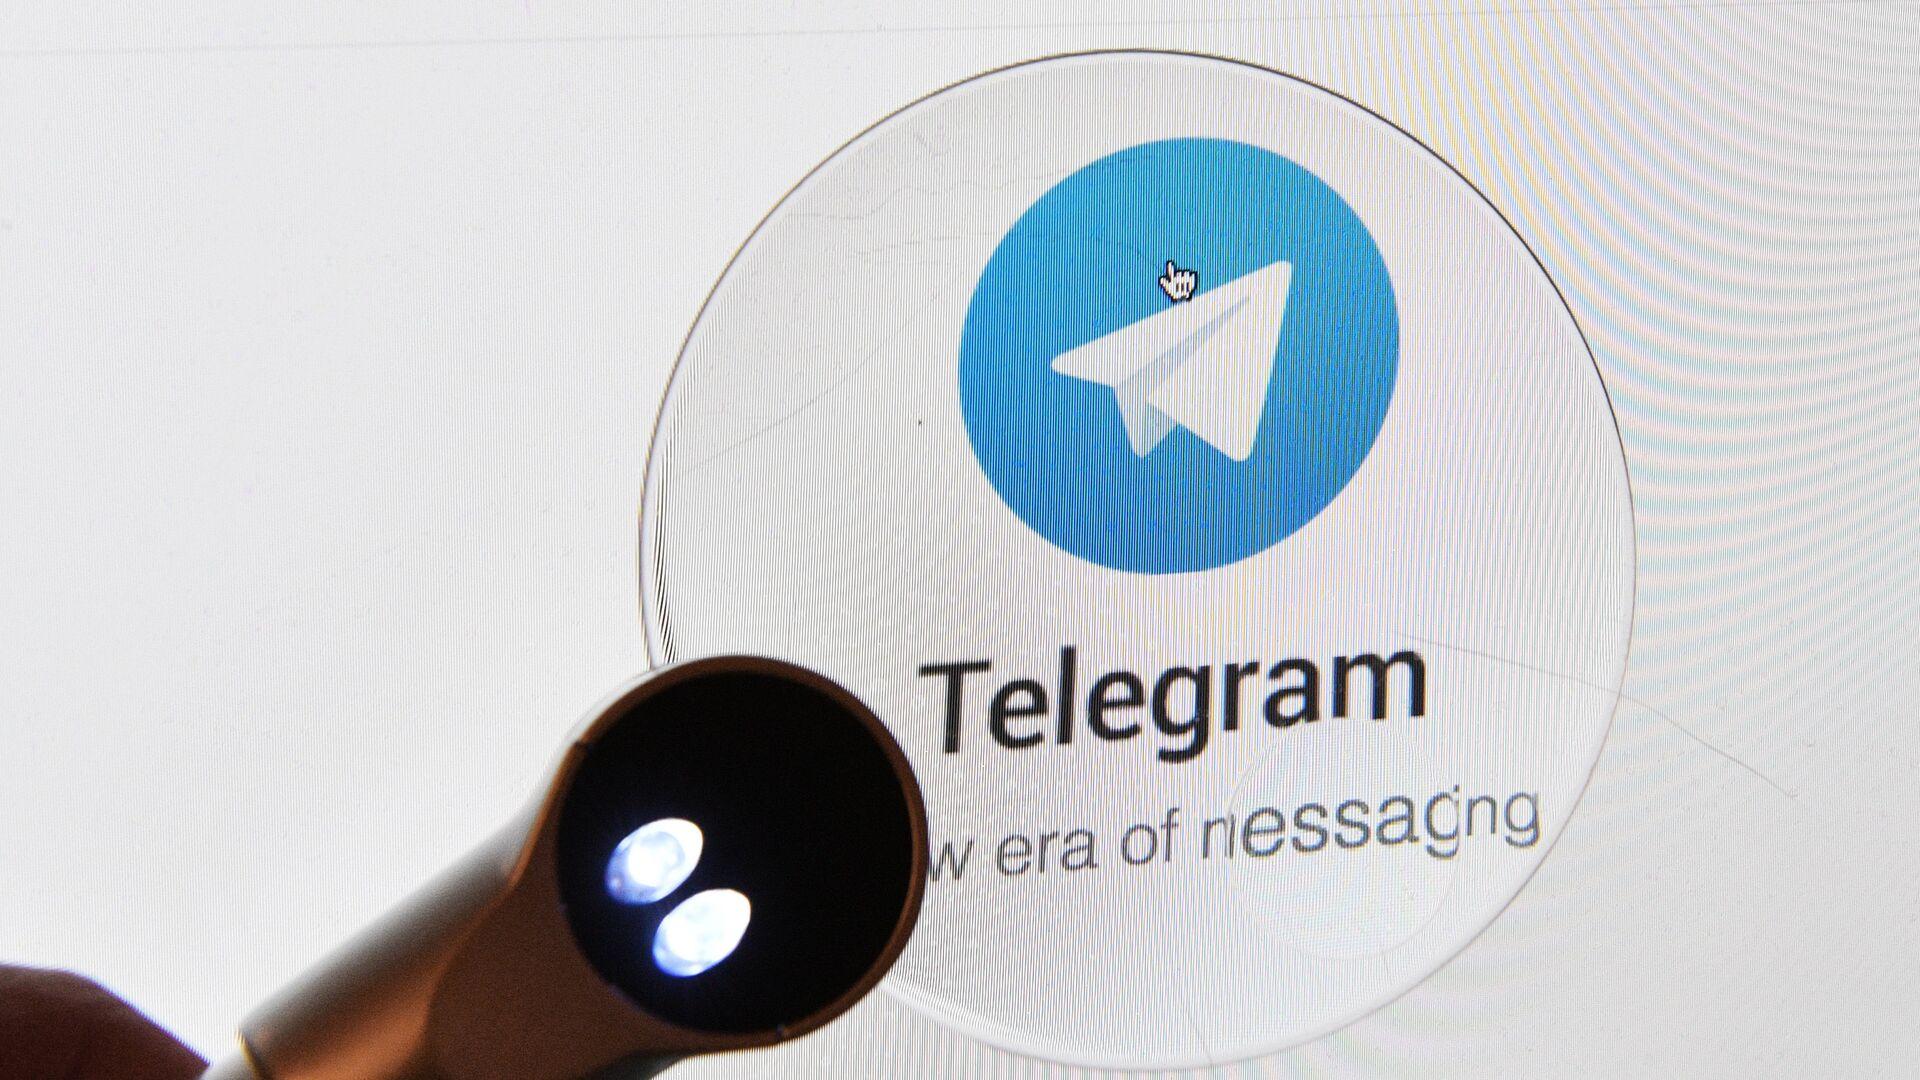 Логотип мессенджера Telegram на экране планшета. - Sputnik Беларусь, 1920, 17.09.2021